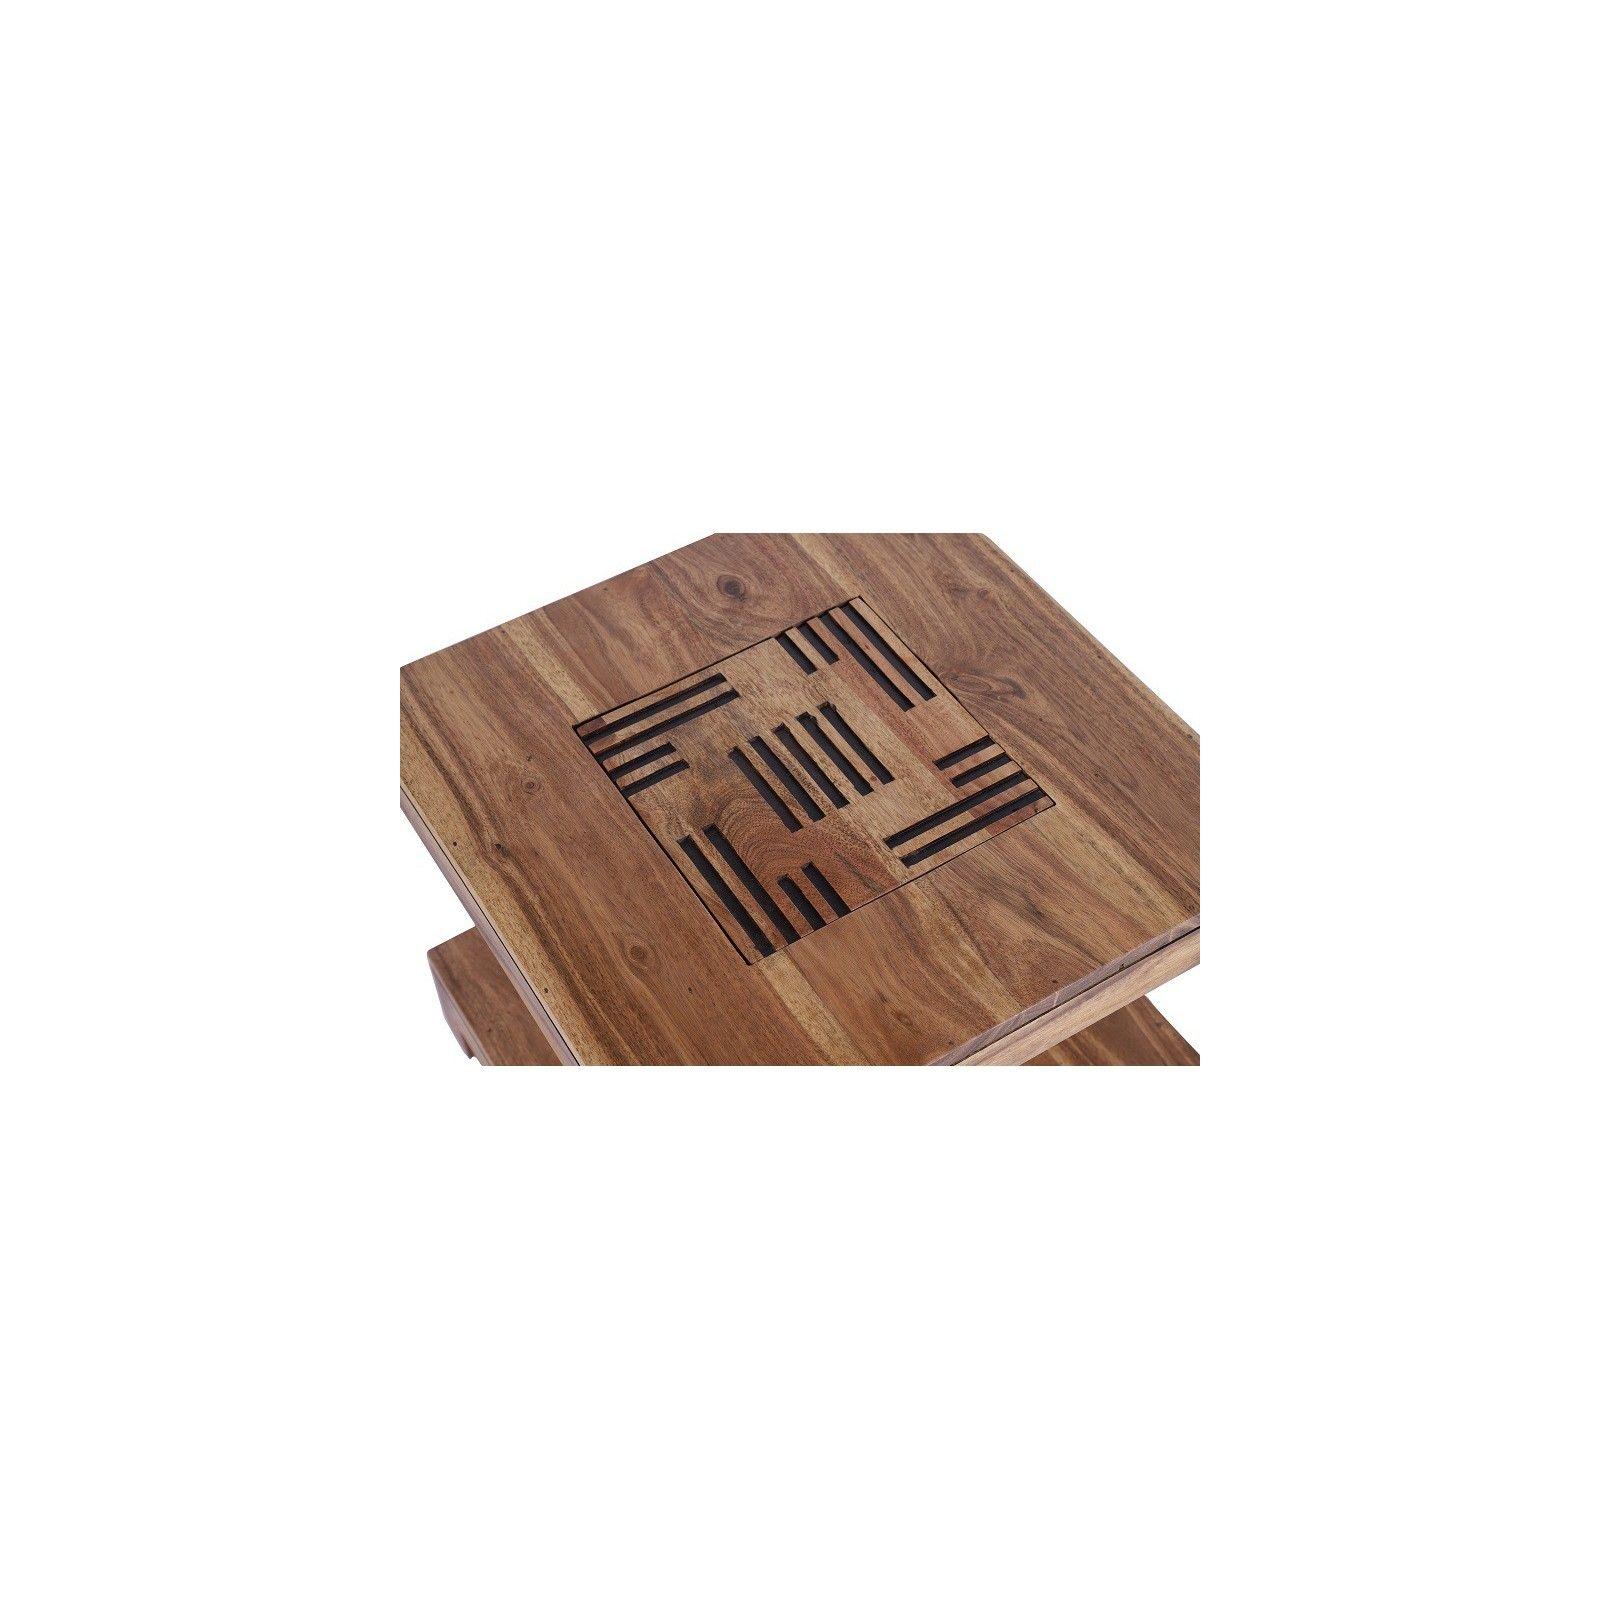 Bout de canapé Kavish haut de gamme en bois d'acacia massif